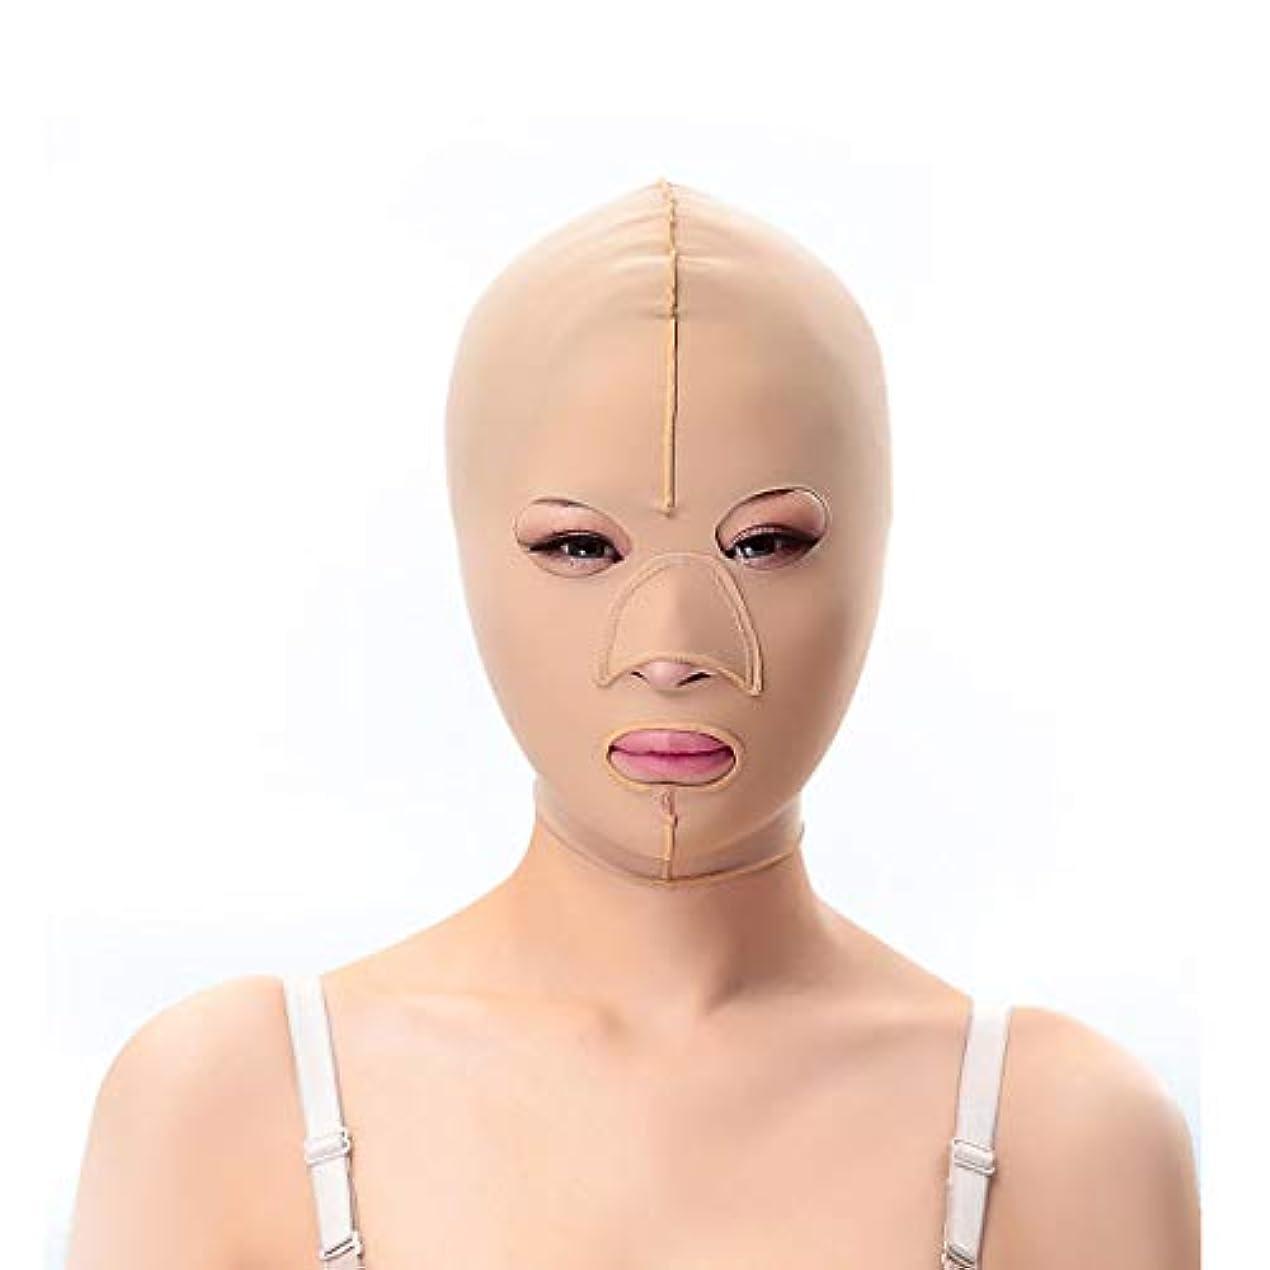 TLMY 減量ベルトマスクフェイスマスク神聖なパターンリフト二重あご引き締め顔面プラスチック顔面アーティファクト強力な顔面包帯 顔用整形マスク (Size : S)